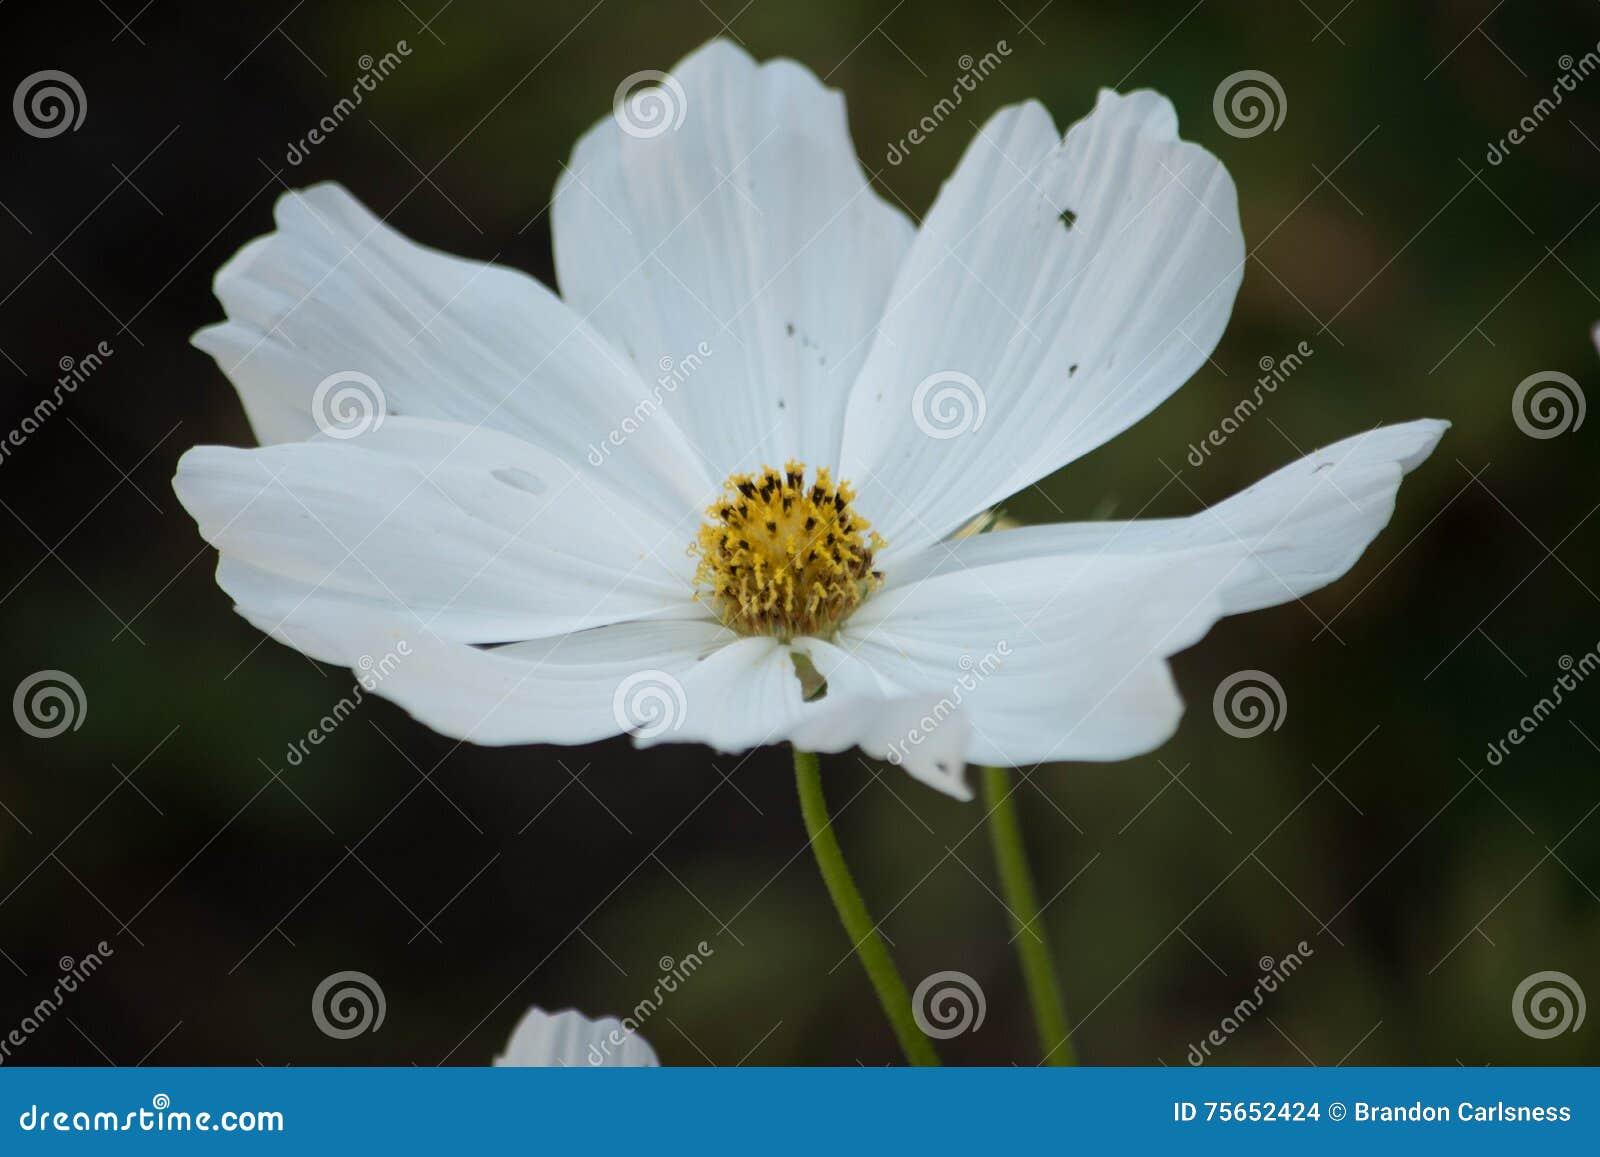 Single white cosmo flower in nature stock photo image of garden single white cosmo flower in nature mightylinksfo